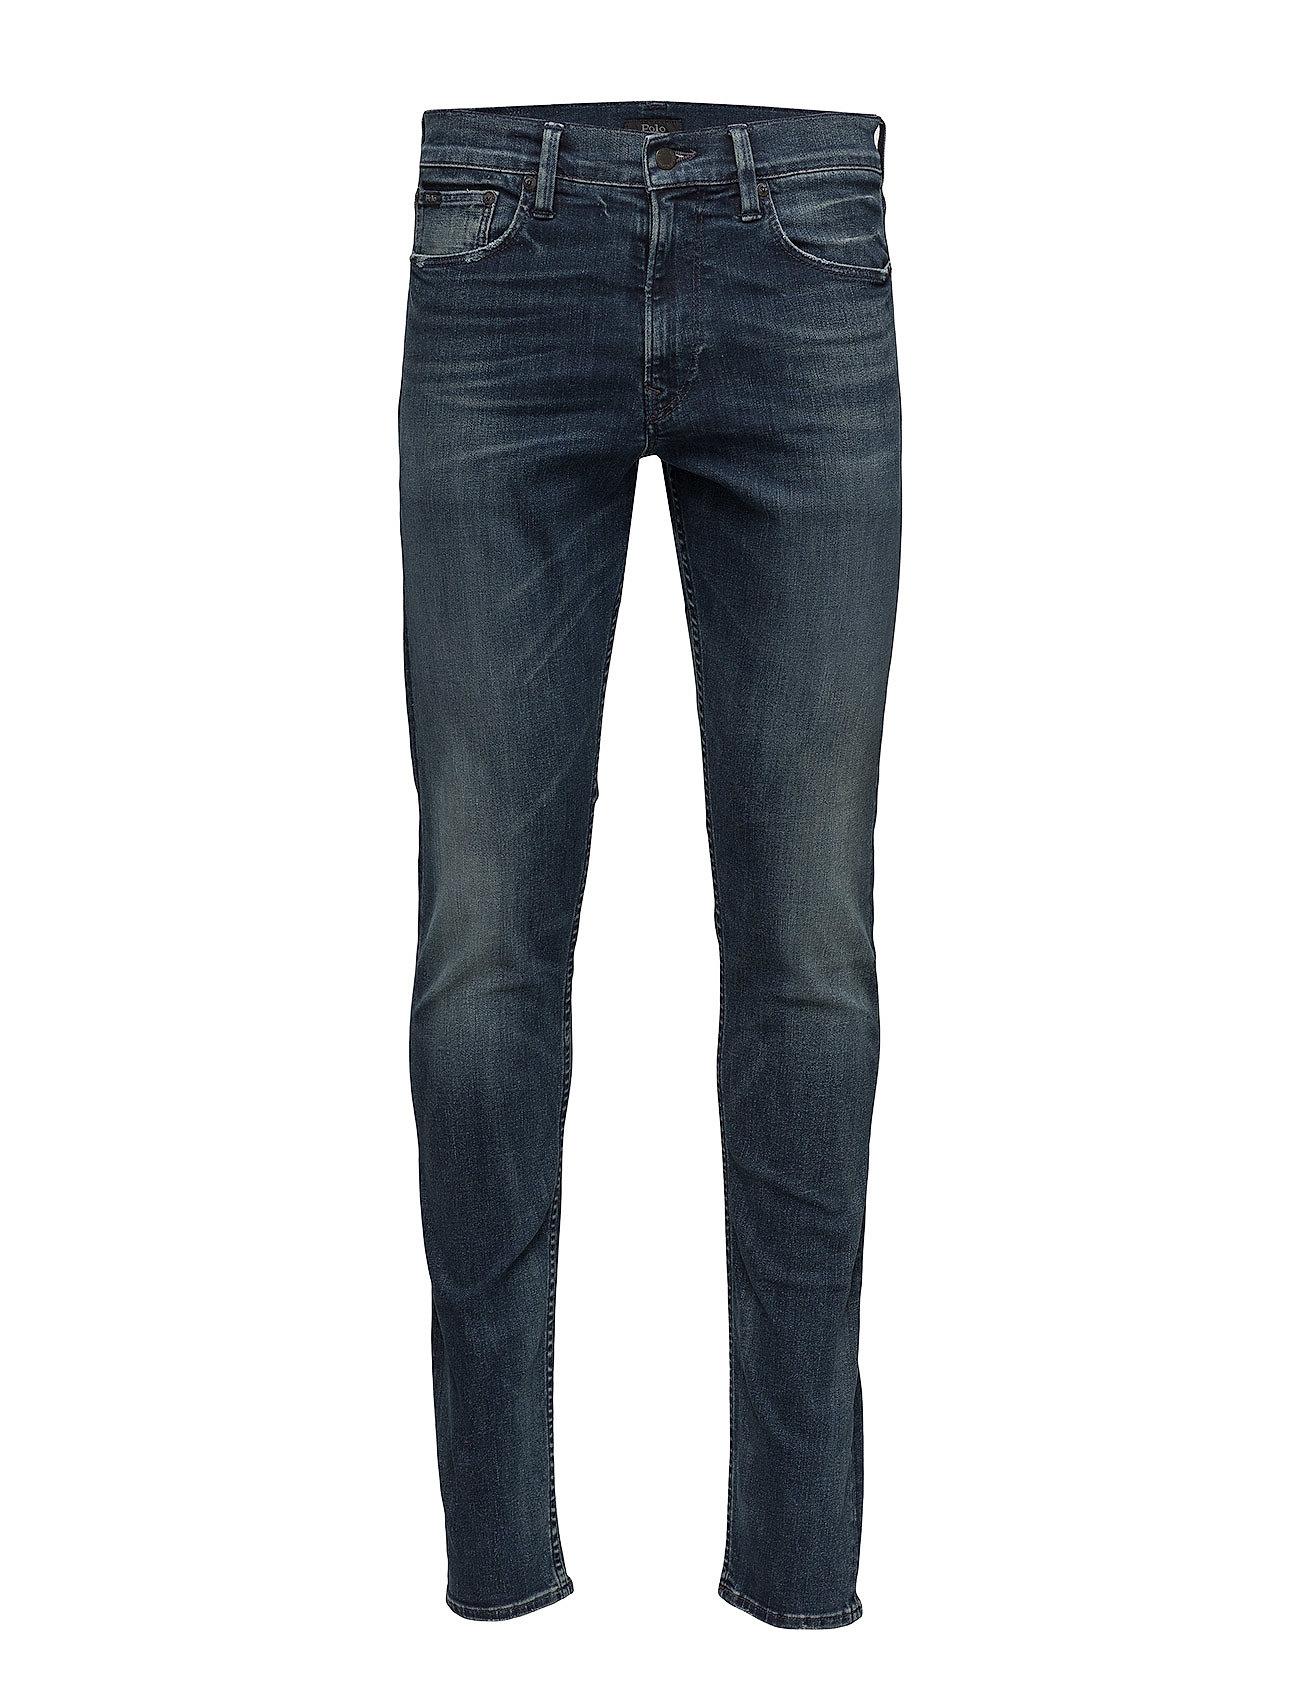 Polo Ralph Lauren Eldridge Performance Skinny Jean